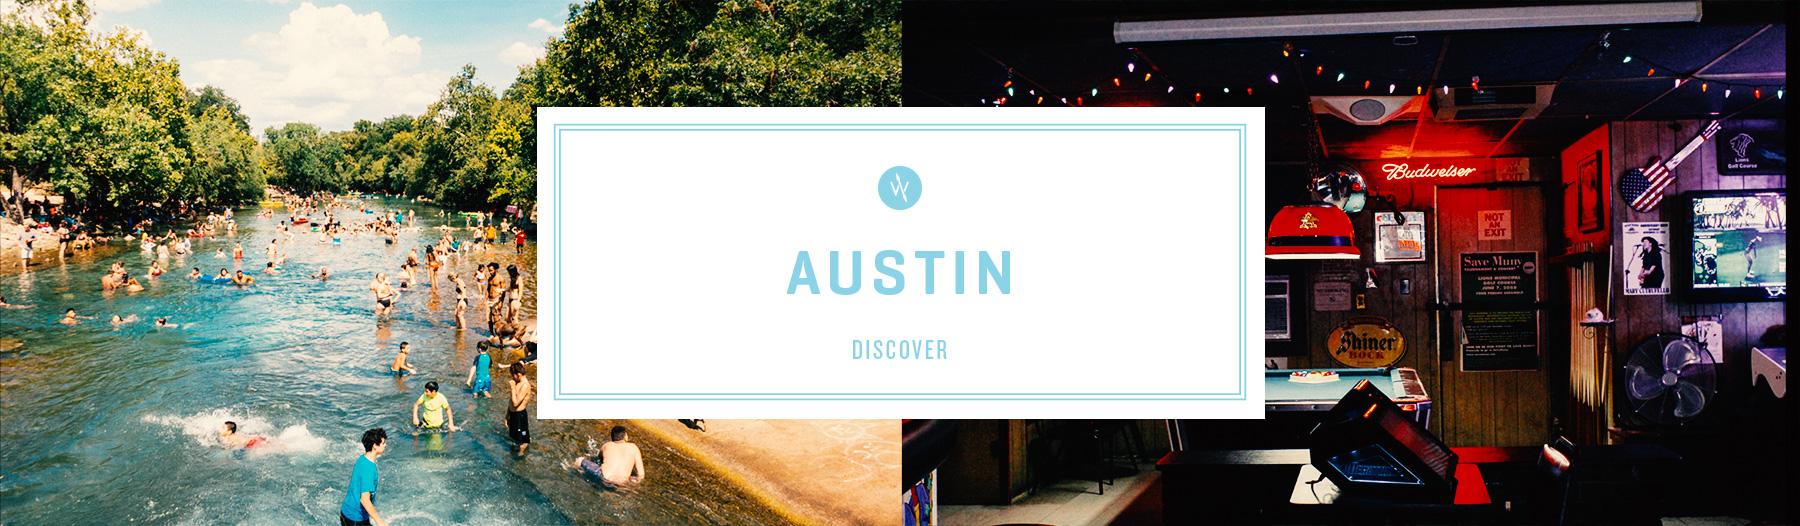 WILDSAM-Austin-HEADER.jpg